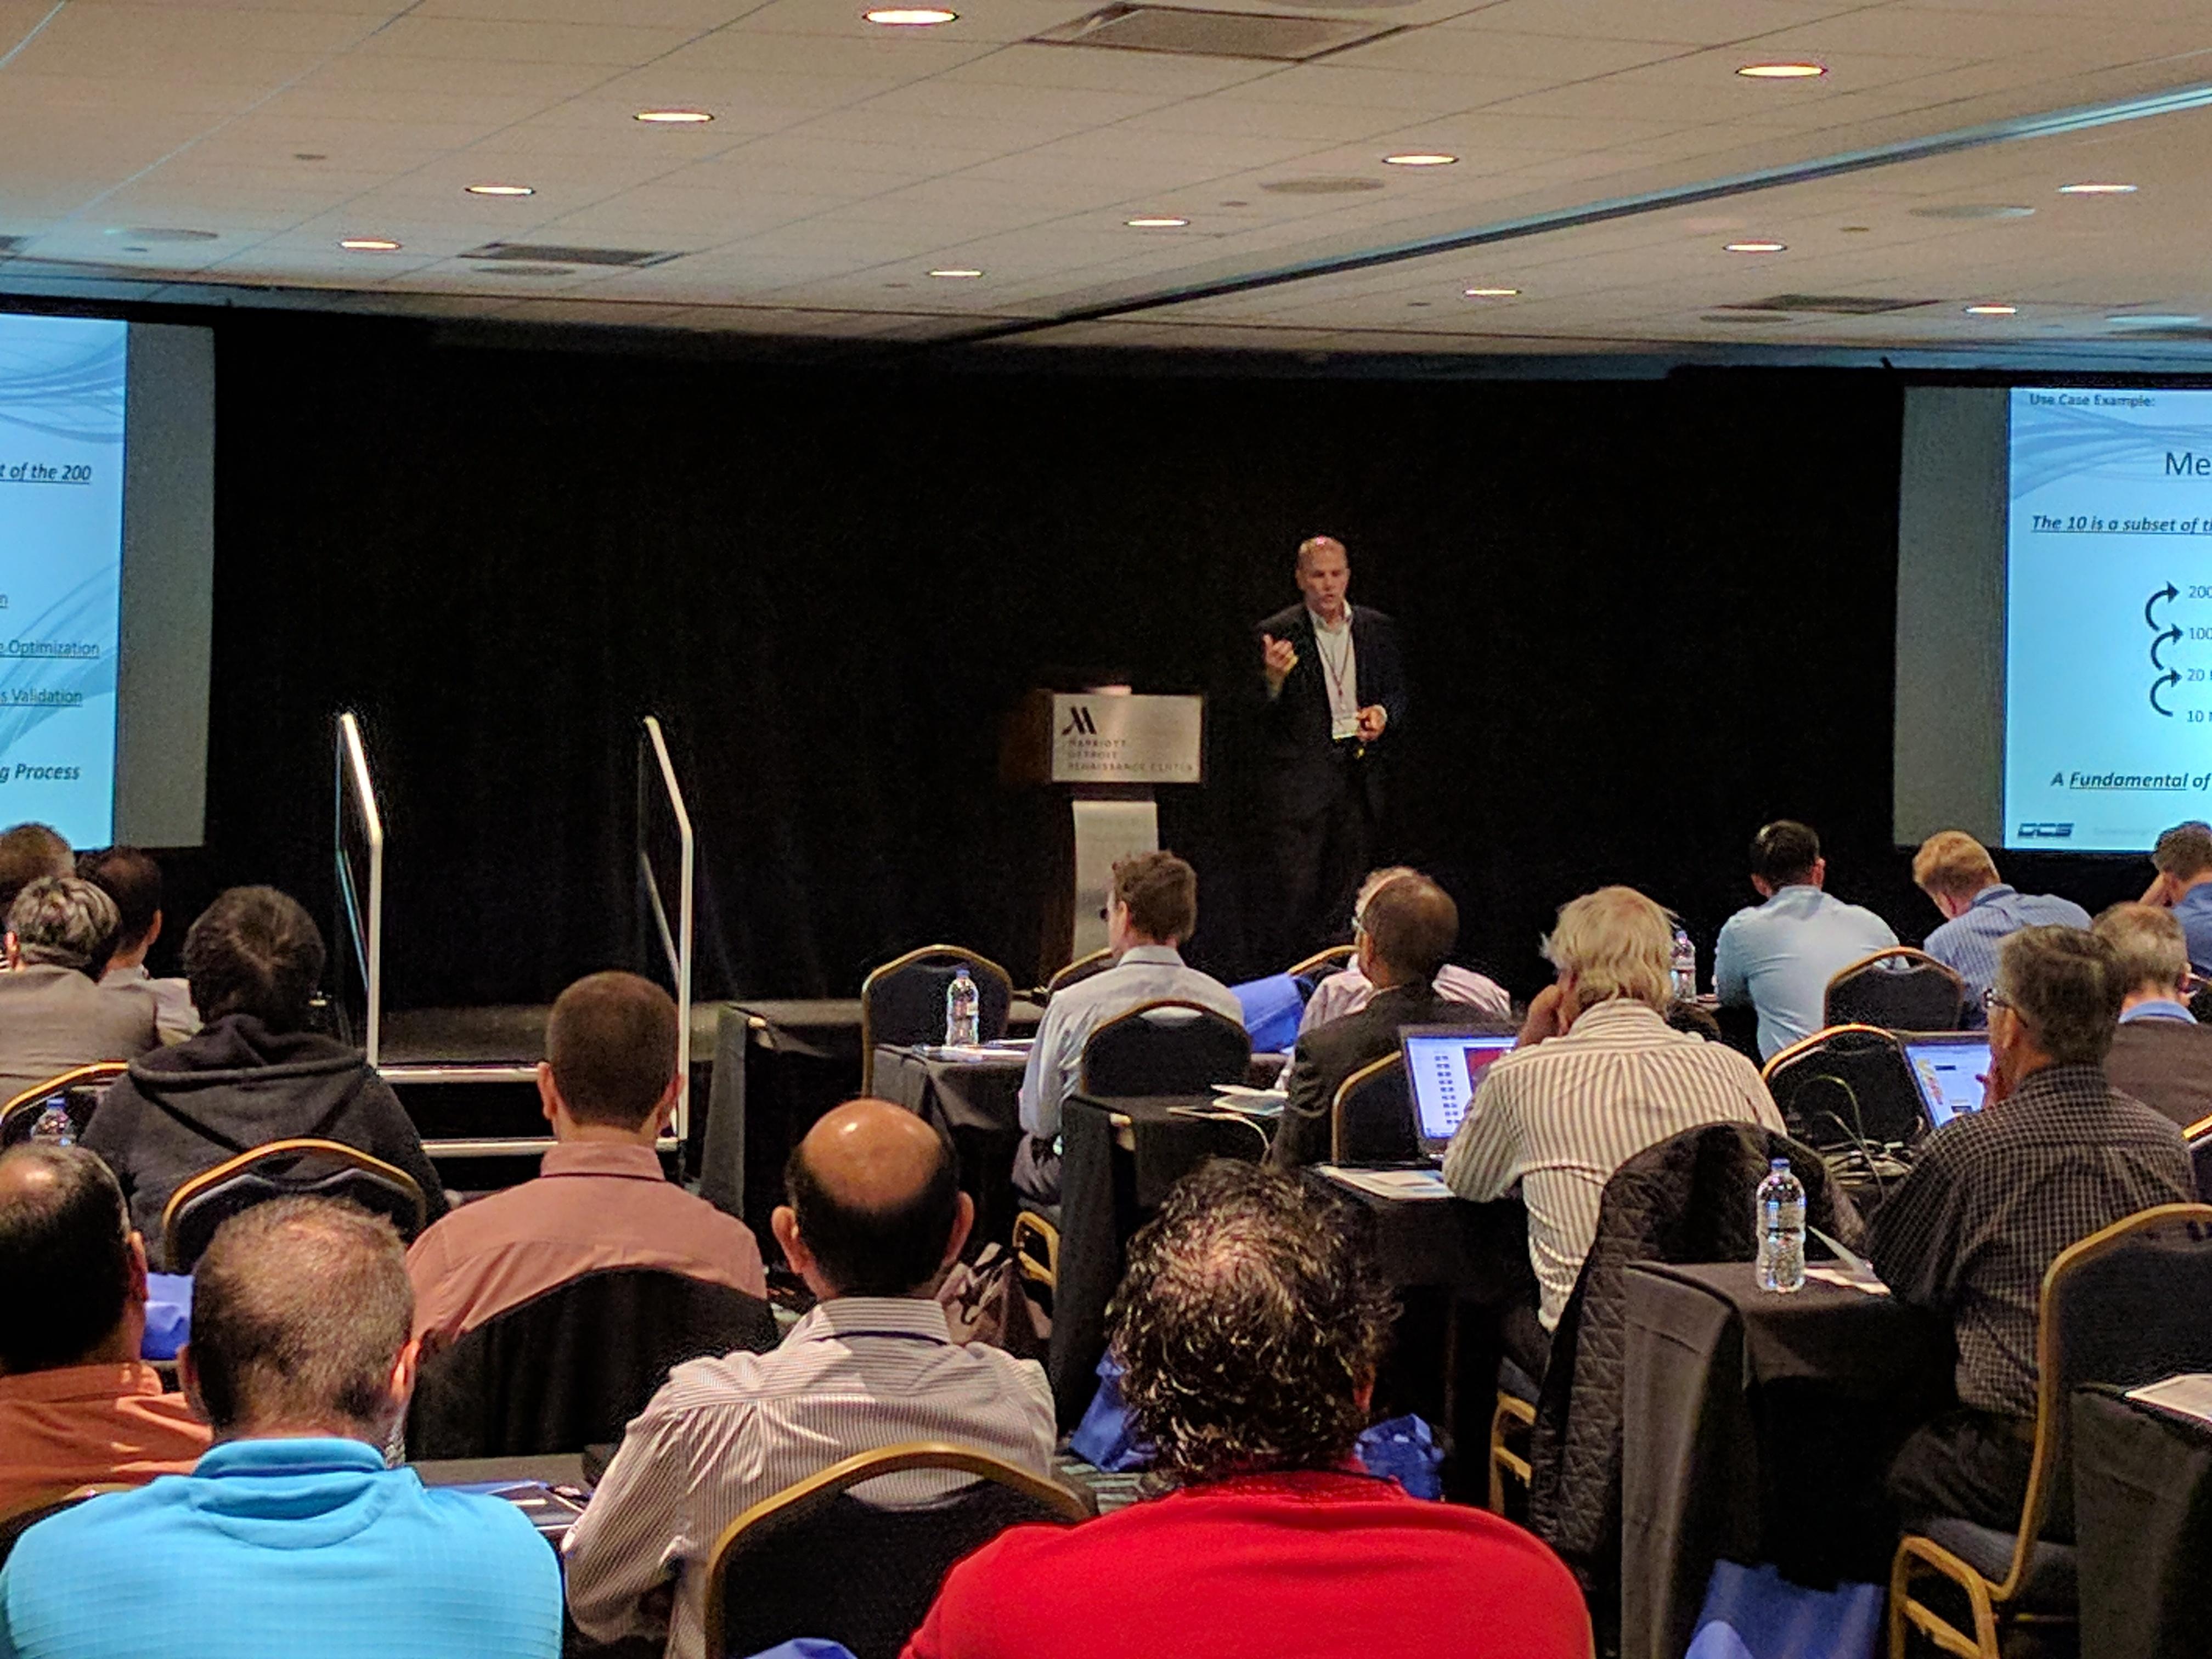 Opening-Keynote-Don-Jasurda-Tolerance-Analysis-Conference-1